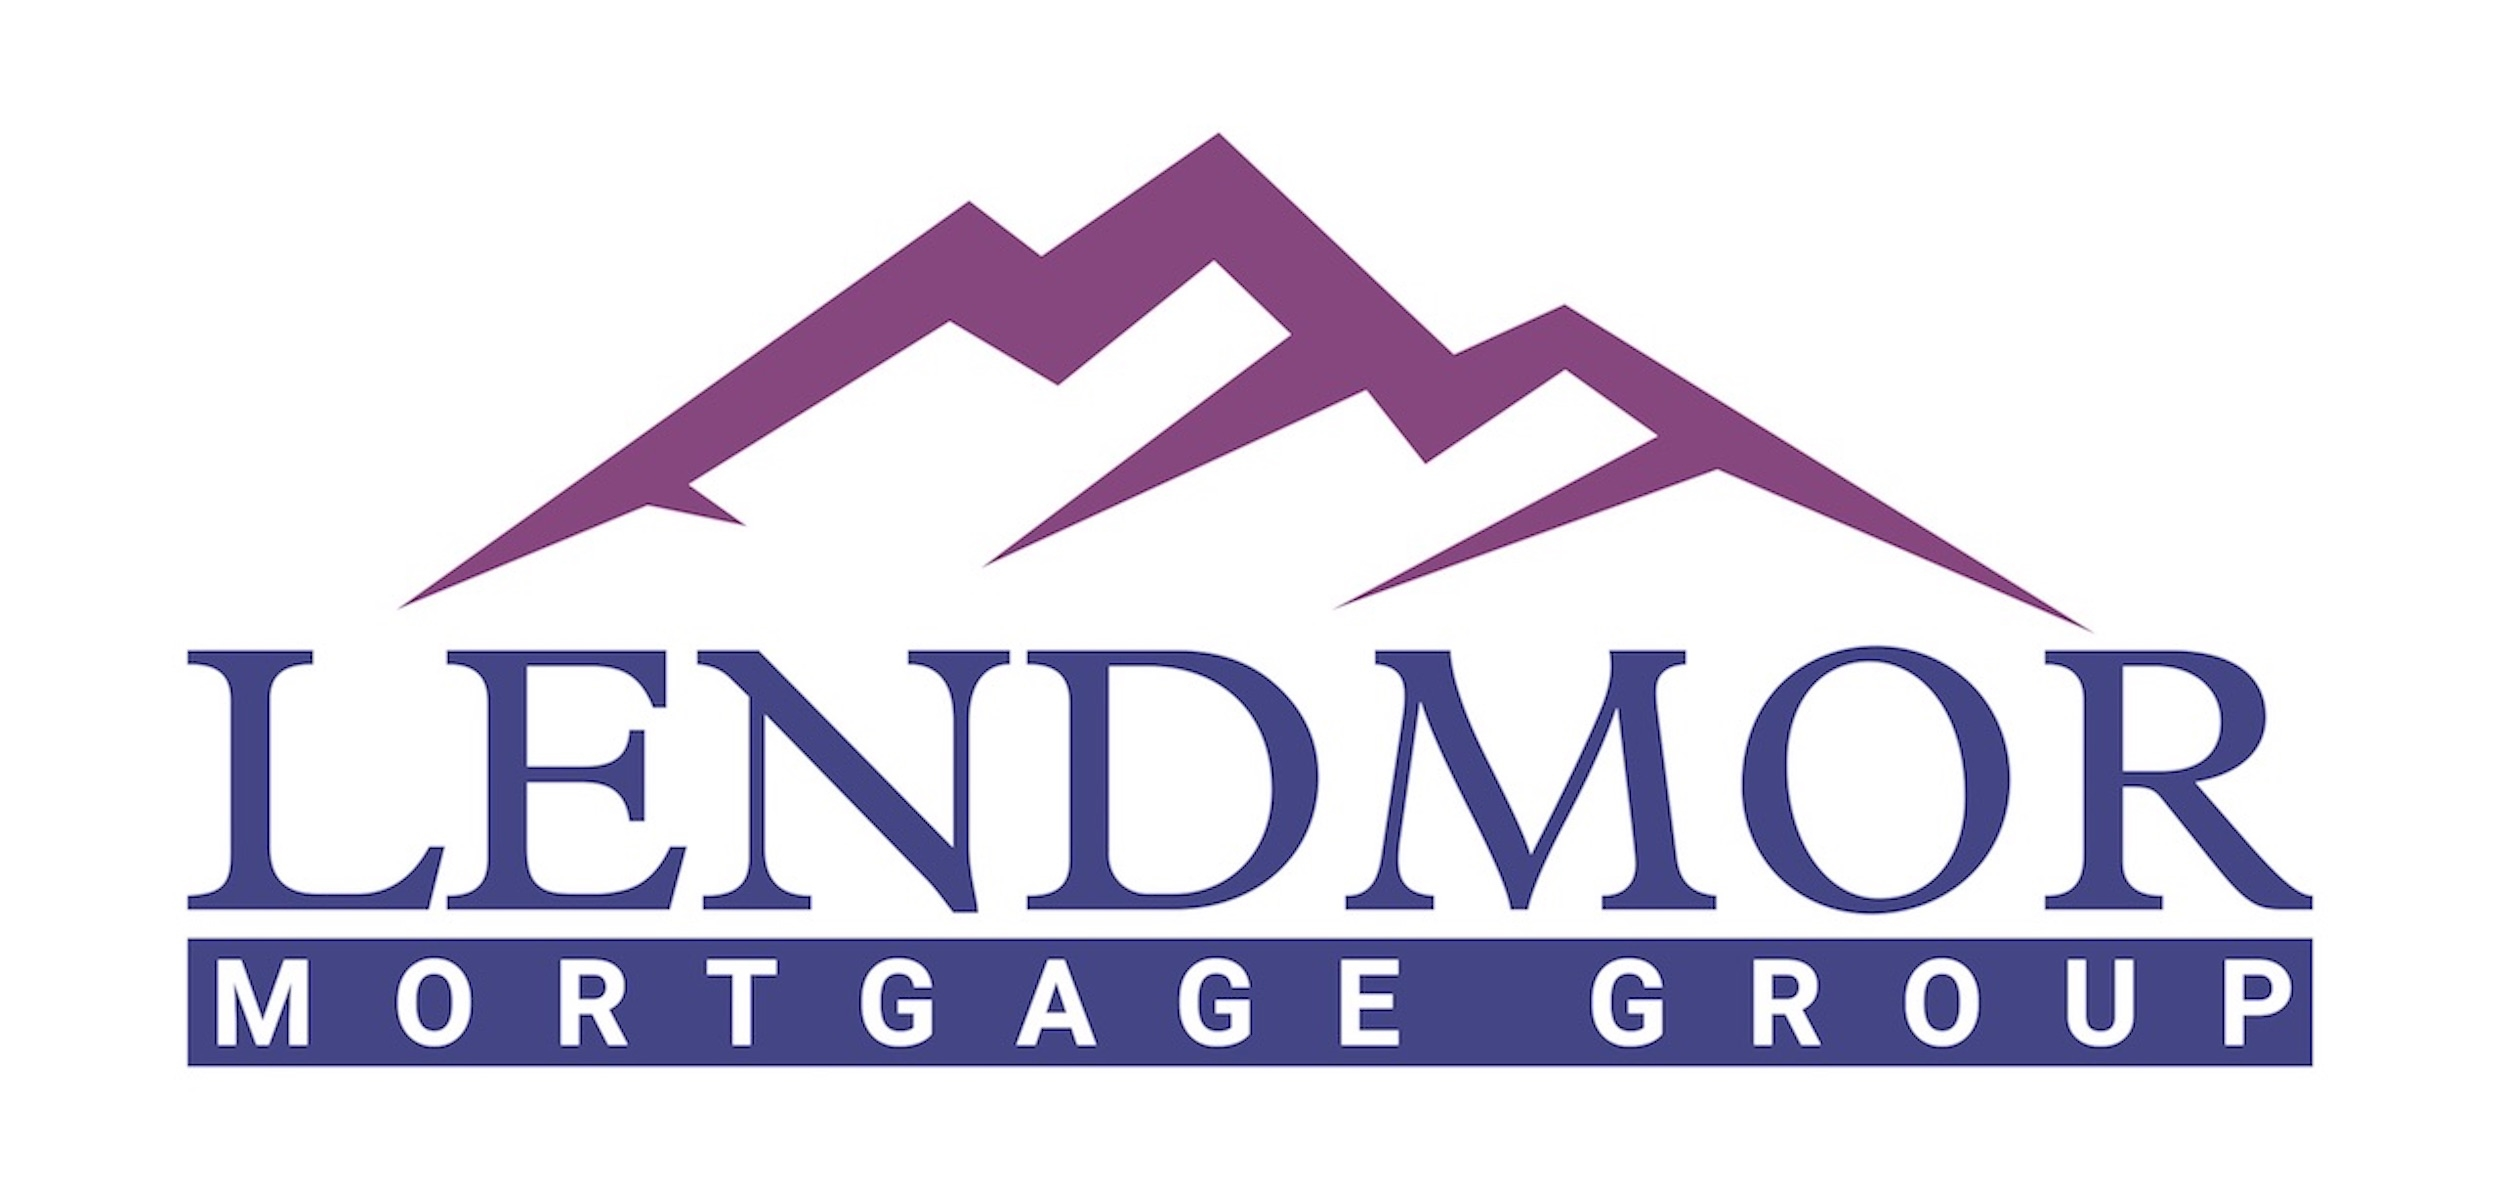 Lendmor Mortgage Group logo